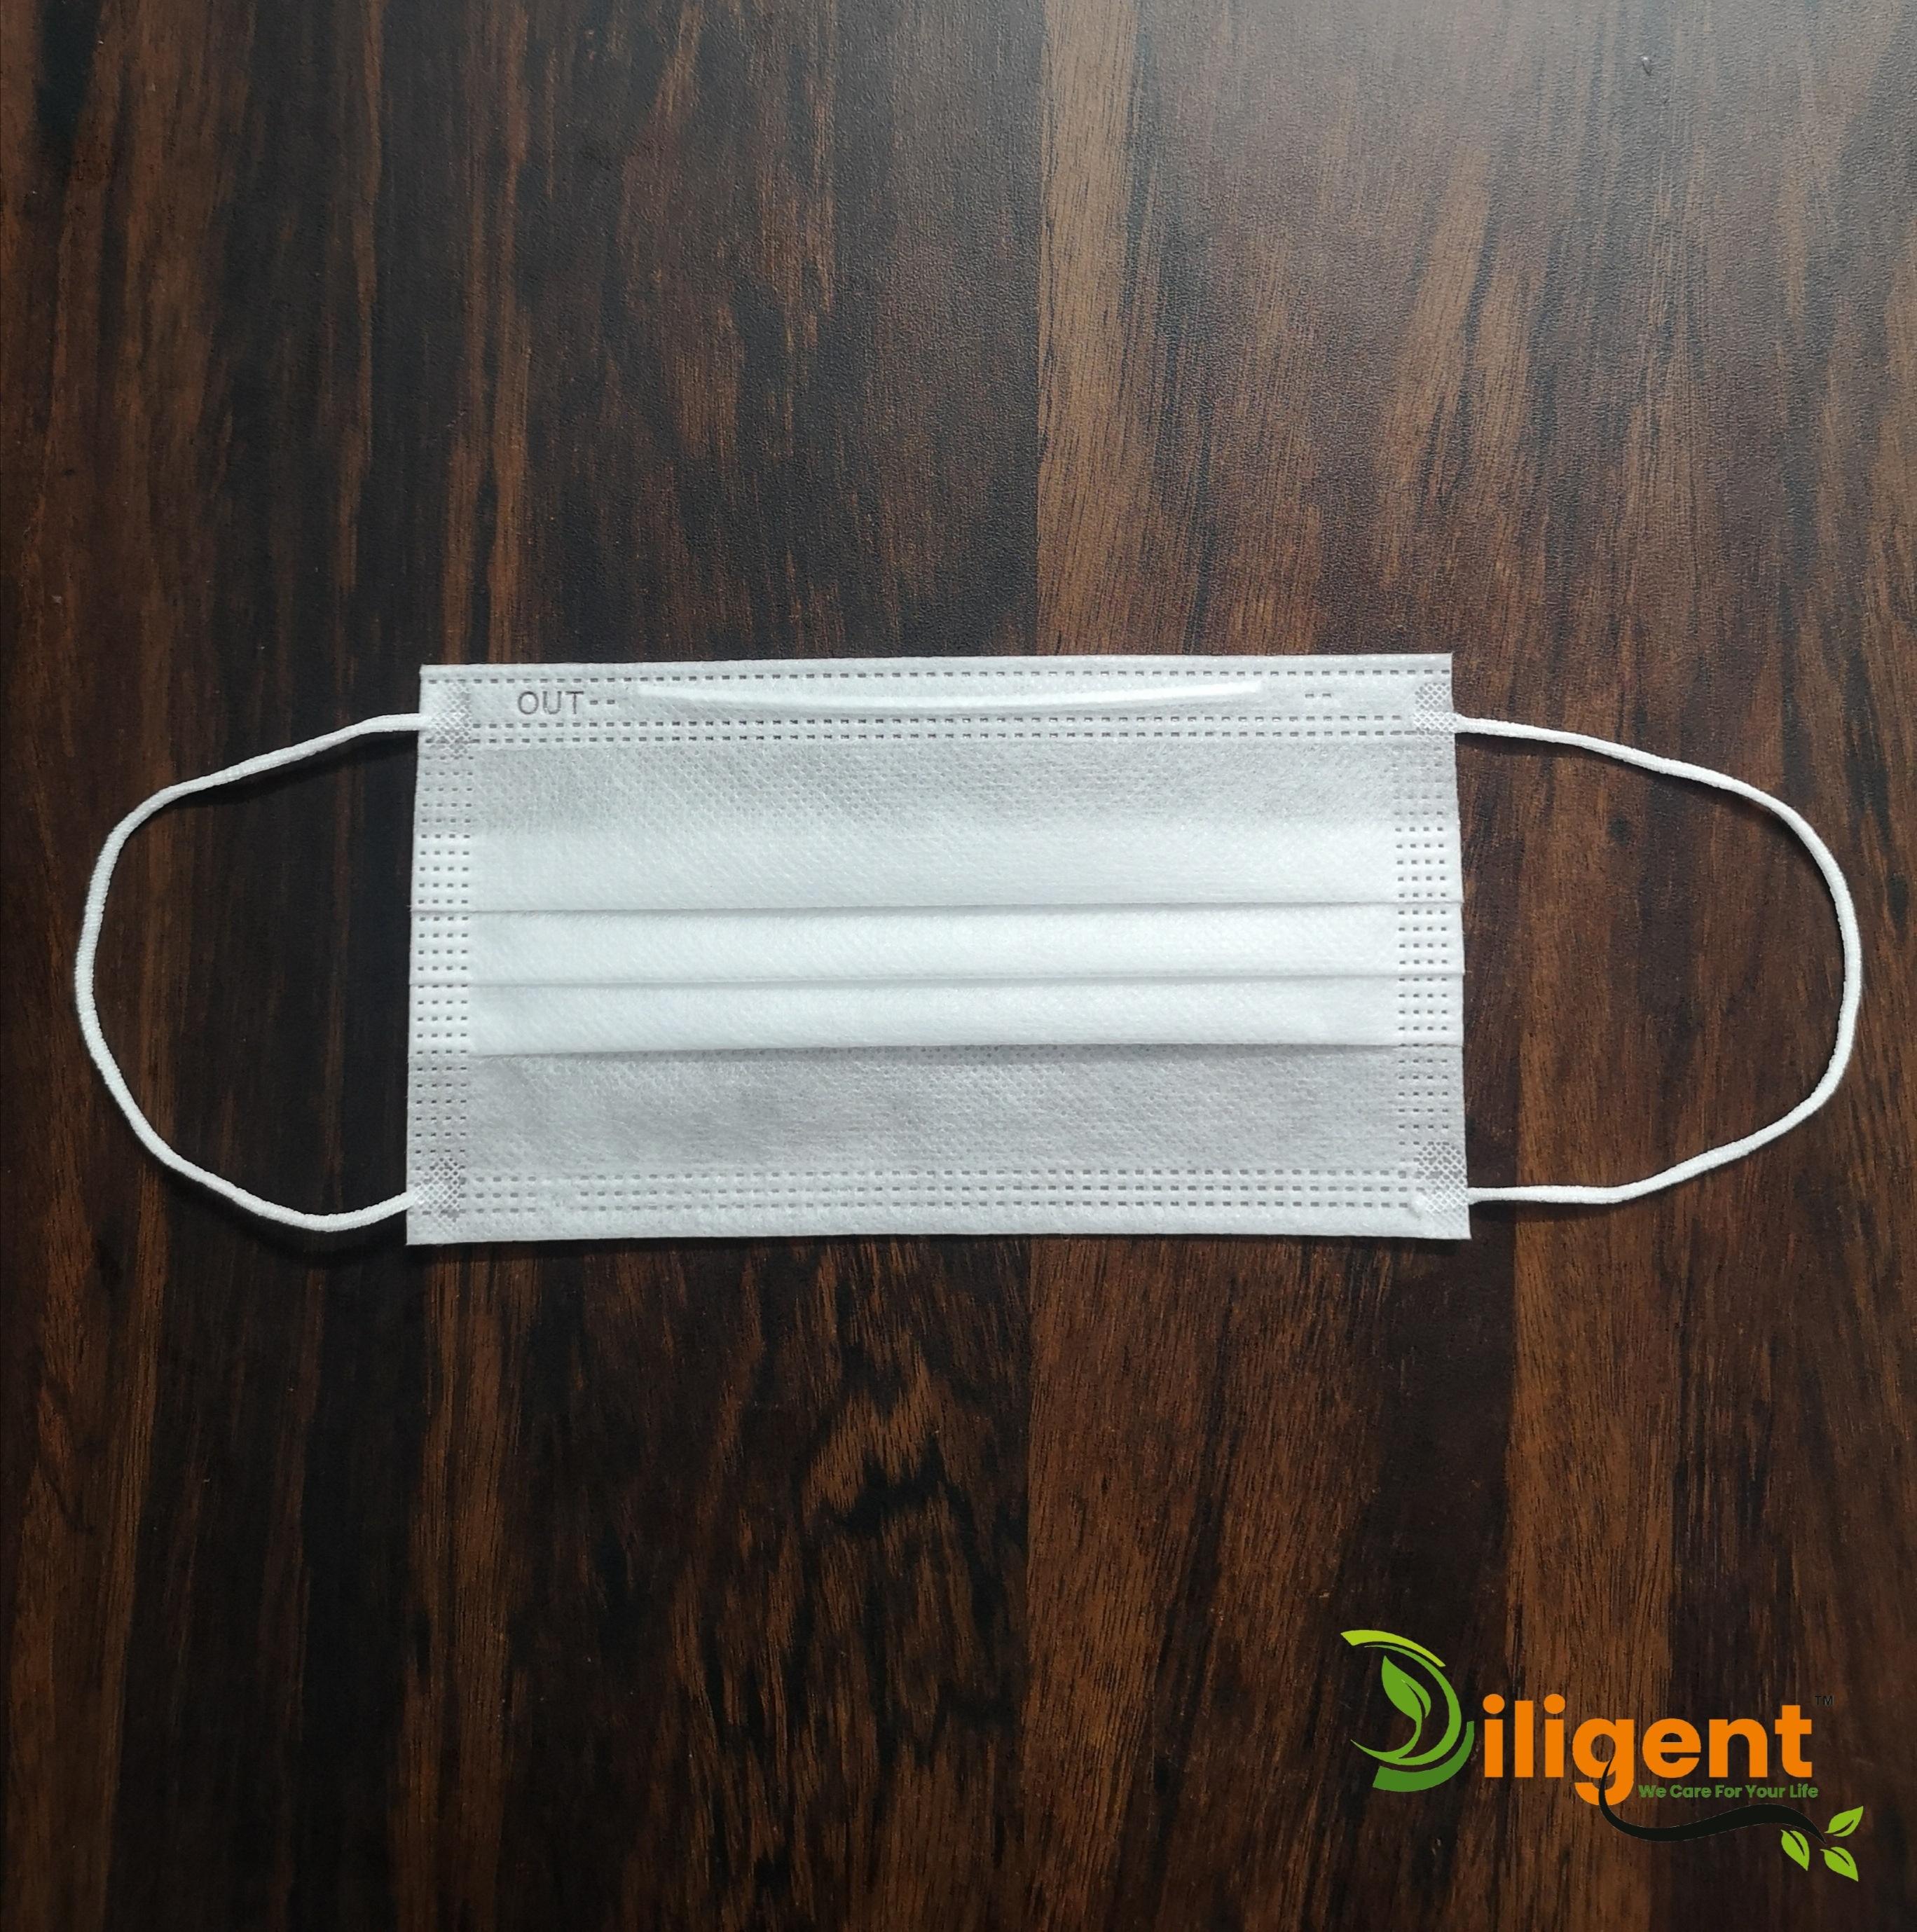 White 3 Ply Non Woven Surgical Face Mask